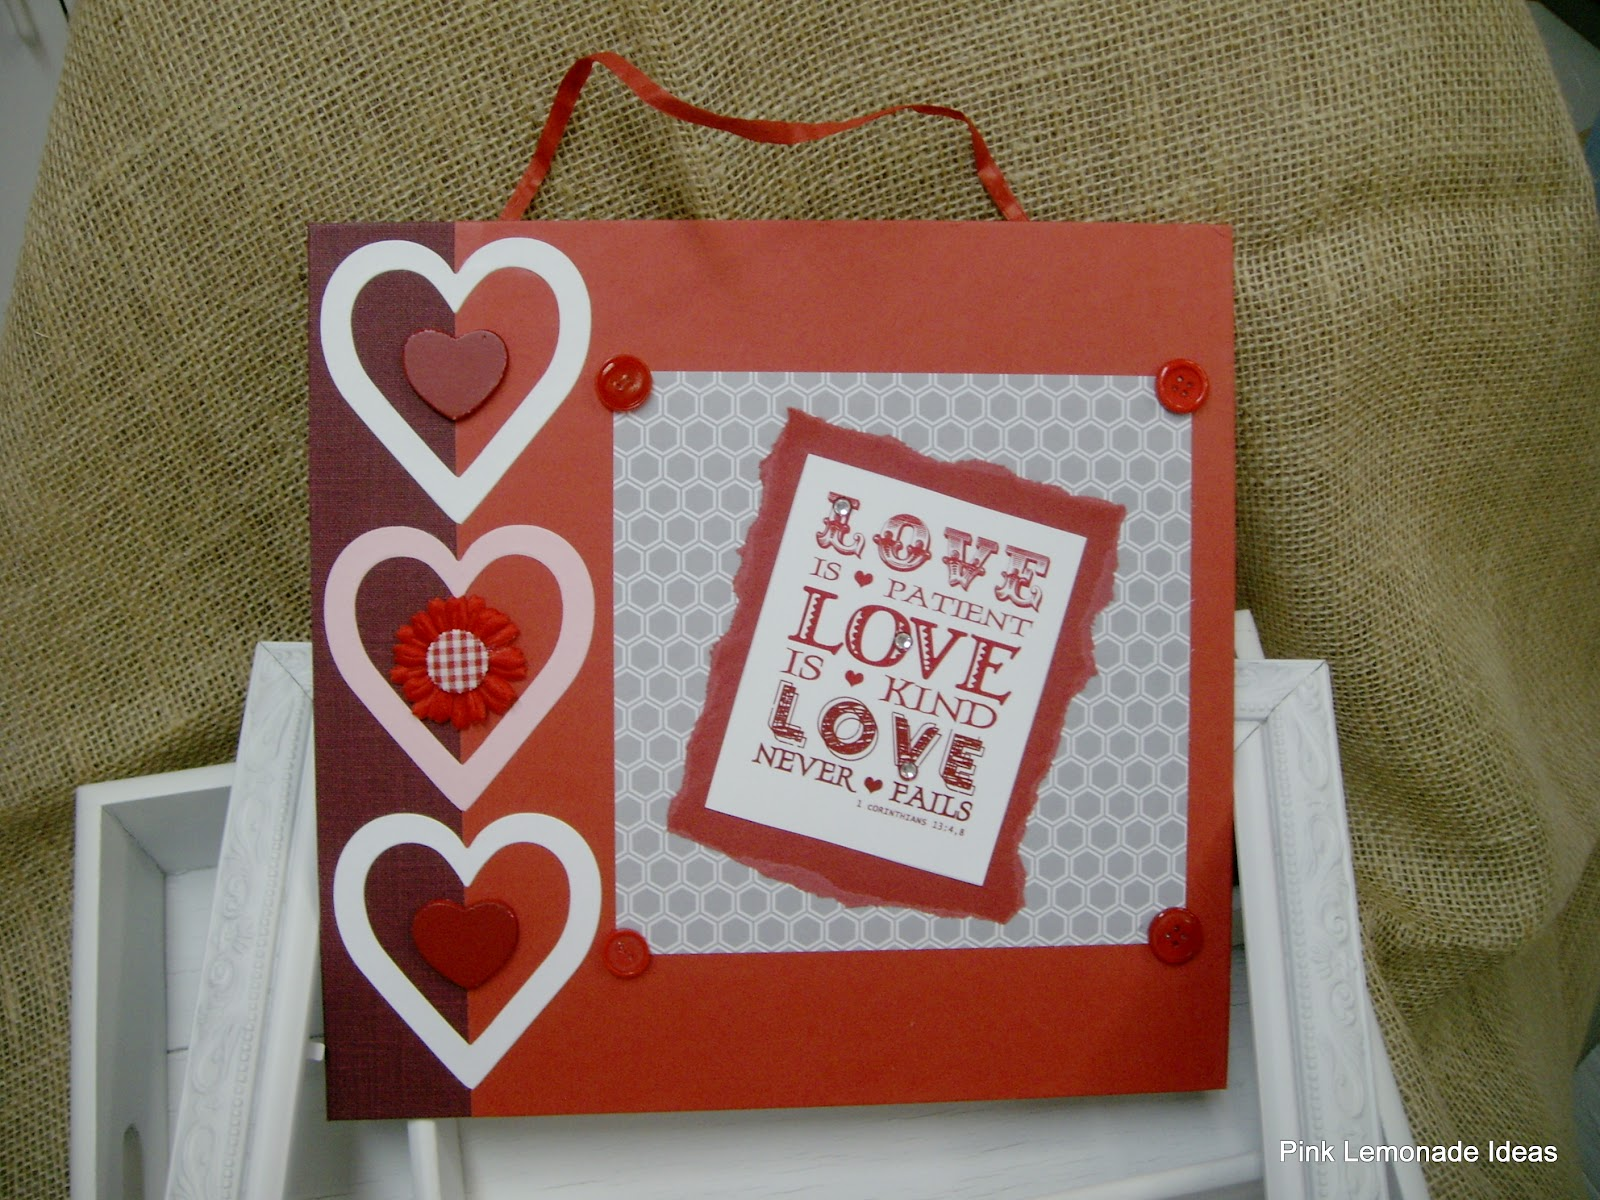 Book Cover Handmade Valentines : Pink lemonade ideas handmade valentine book cover signs